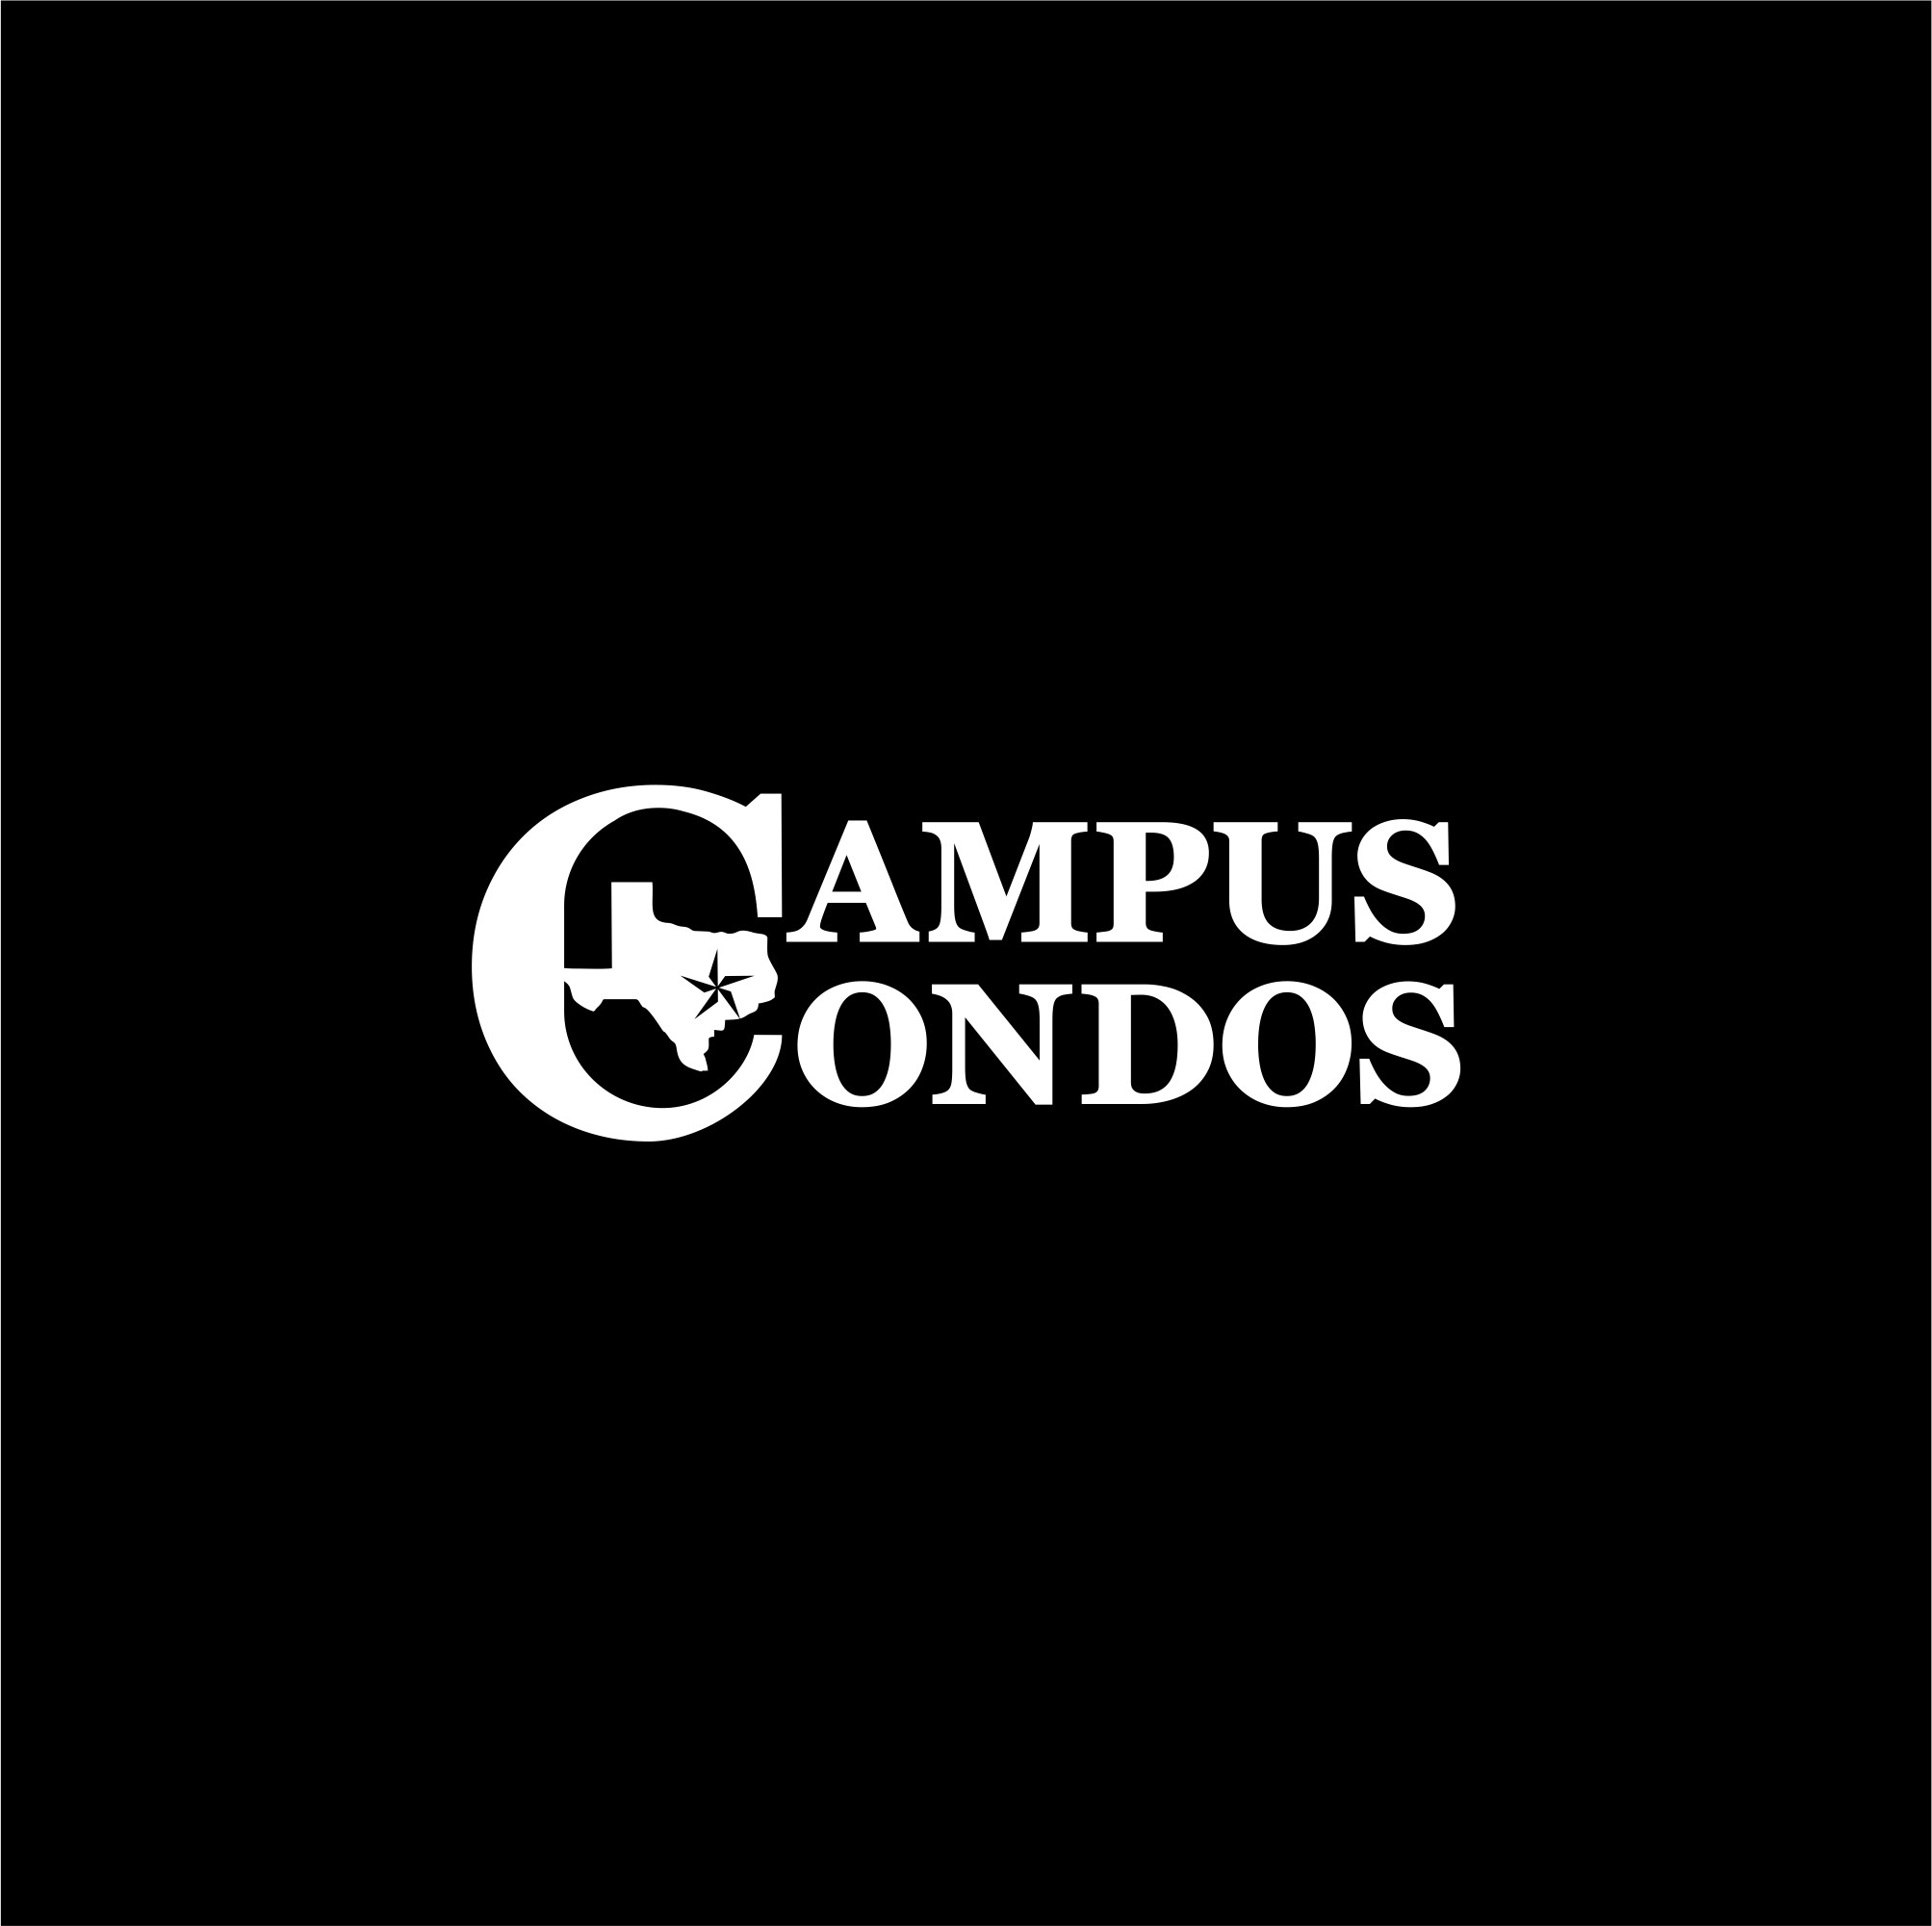 Austin Texas Campus Condos Property Management logo